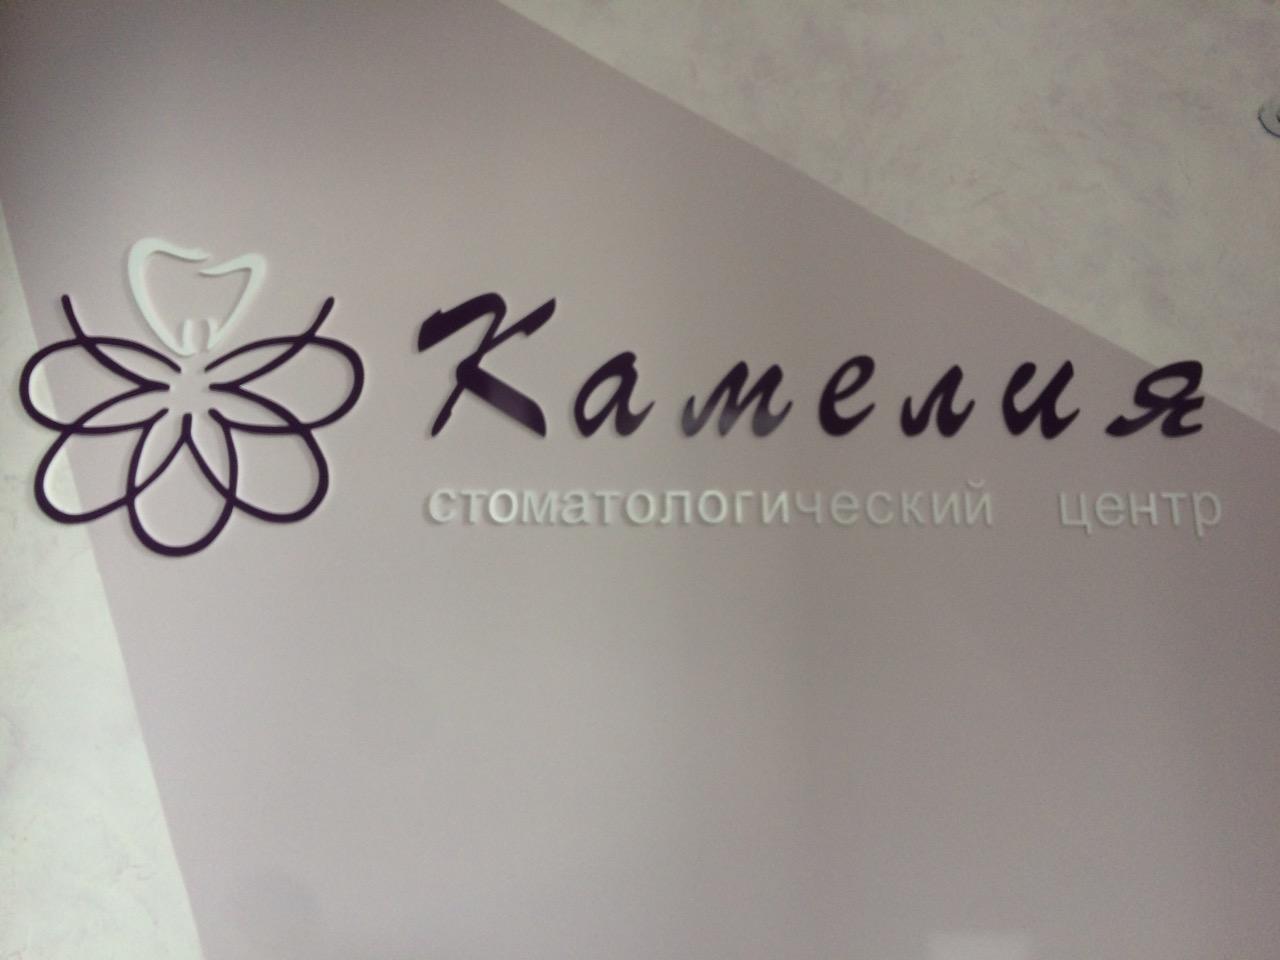 Камелия  - стамотологическая клиника